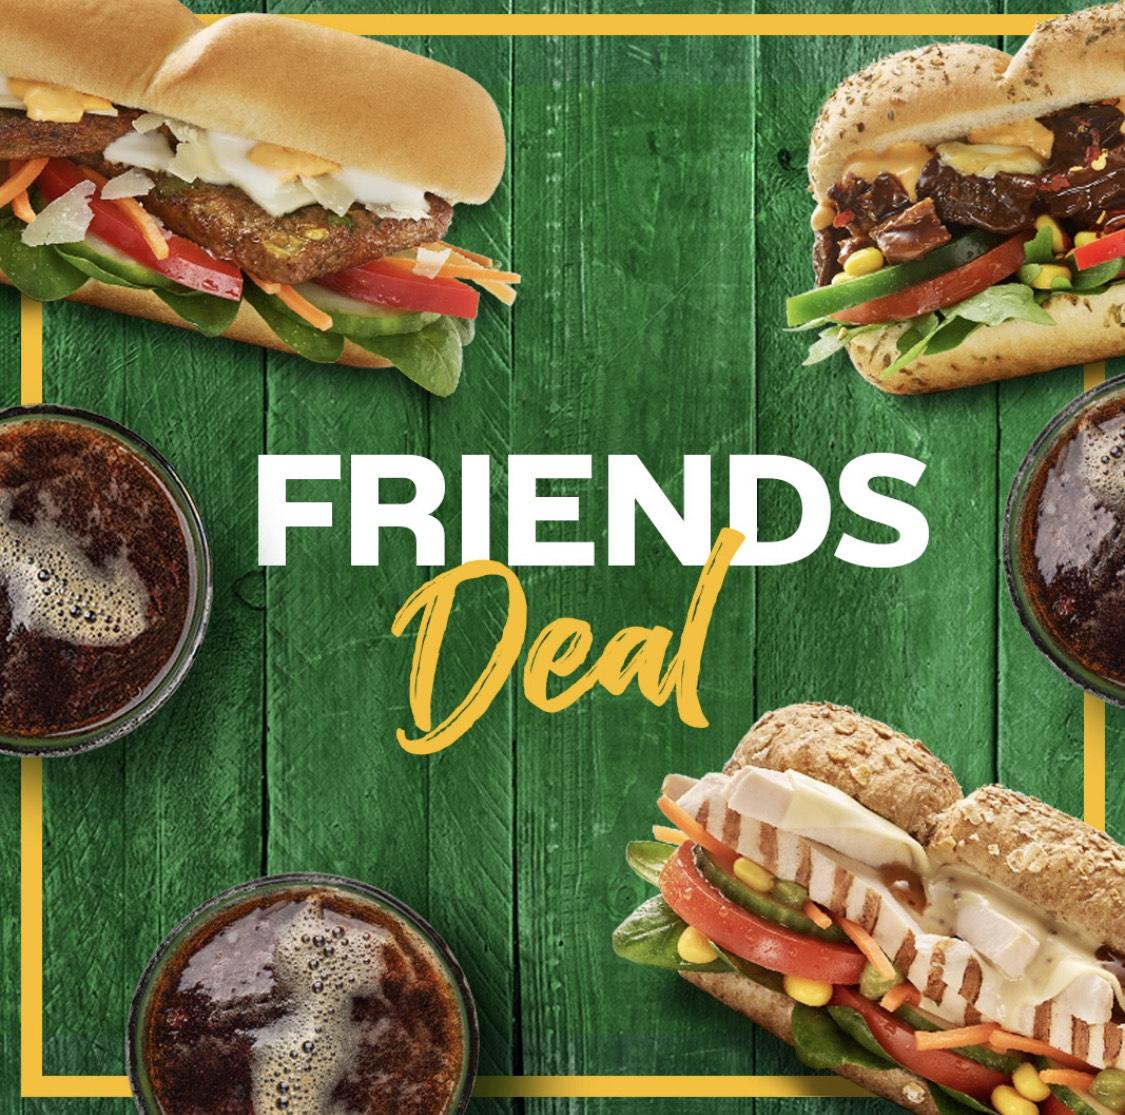 Subway Friends Deal - 3 Footlong & 3 Drinks für 19,99€